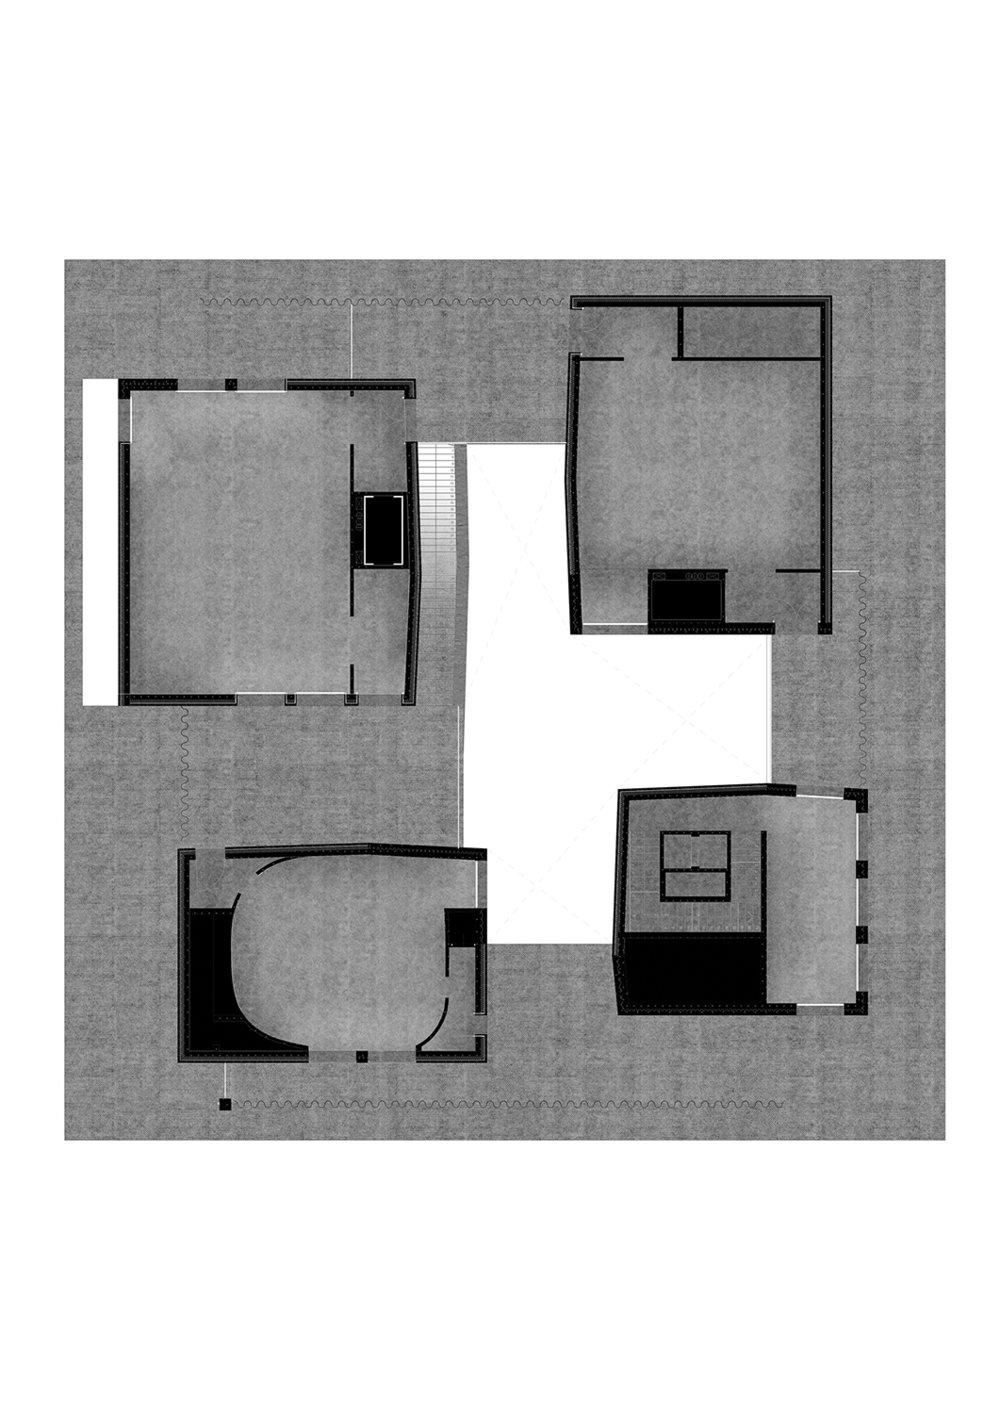 ATD_depot_plan2_web.jpg